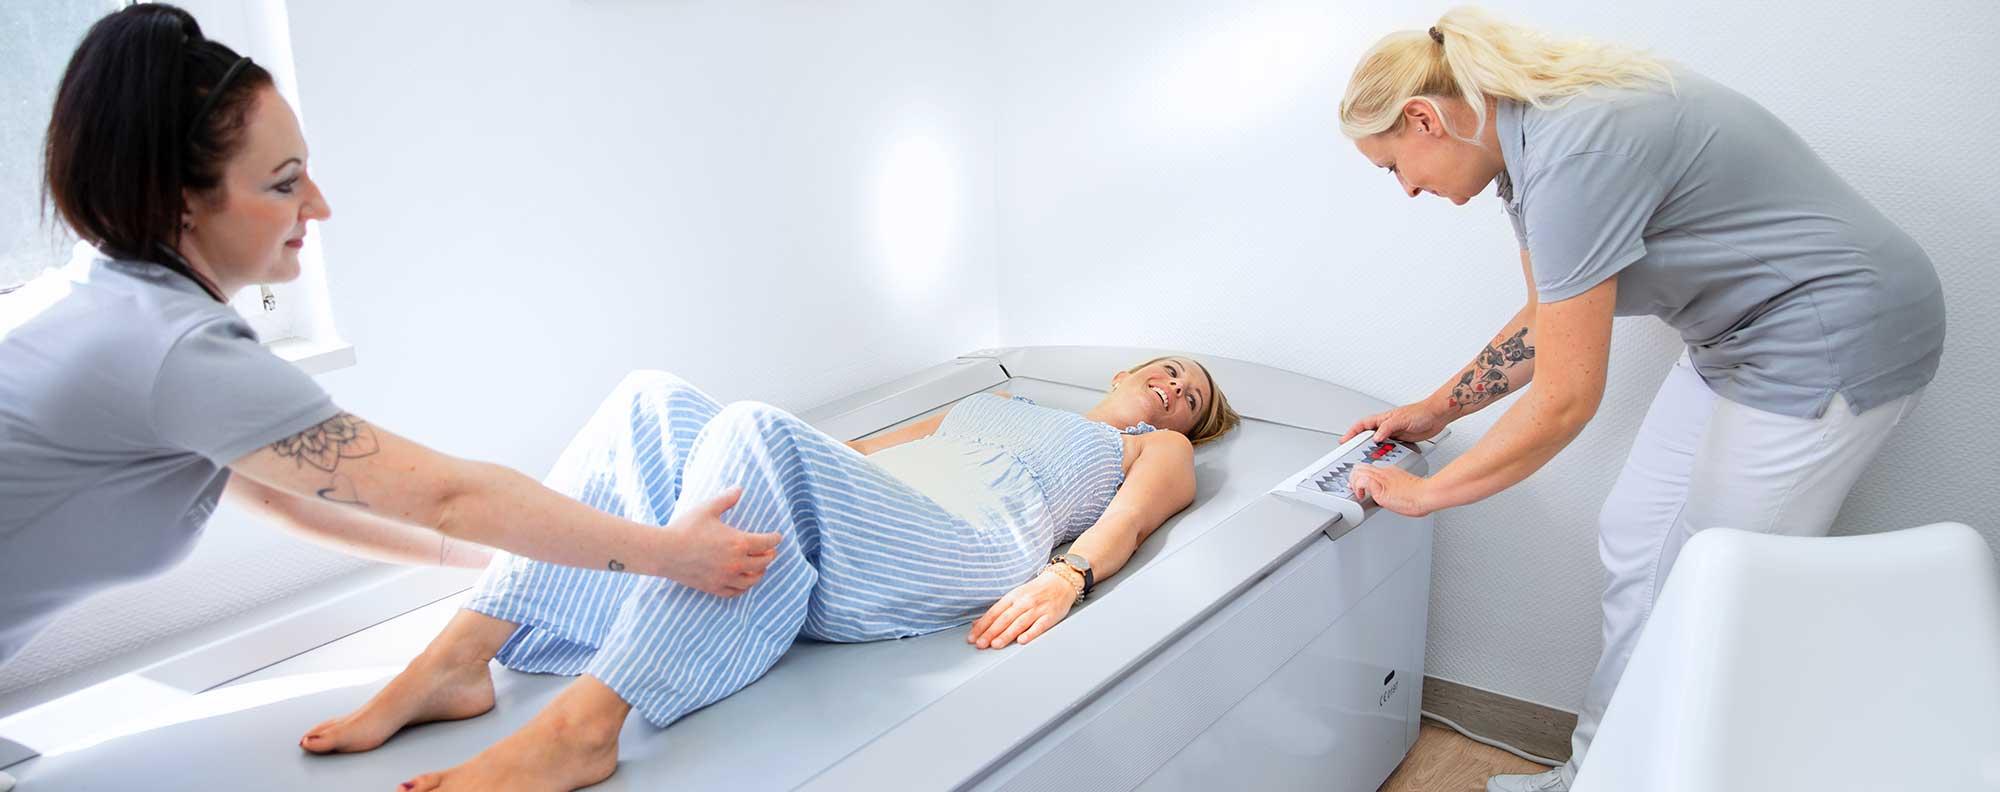 Hydrojet Therapie Ortho Center Professor Omlor